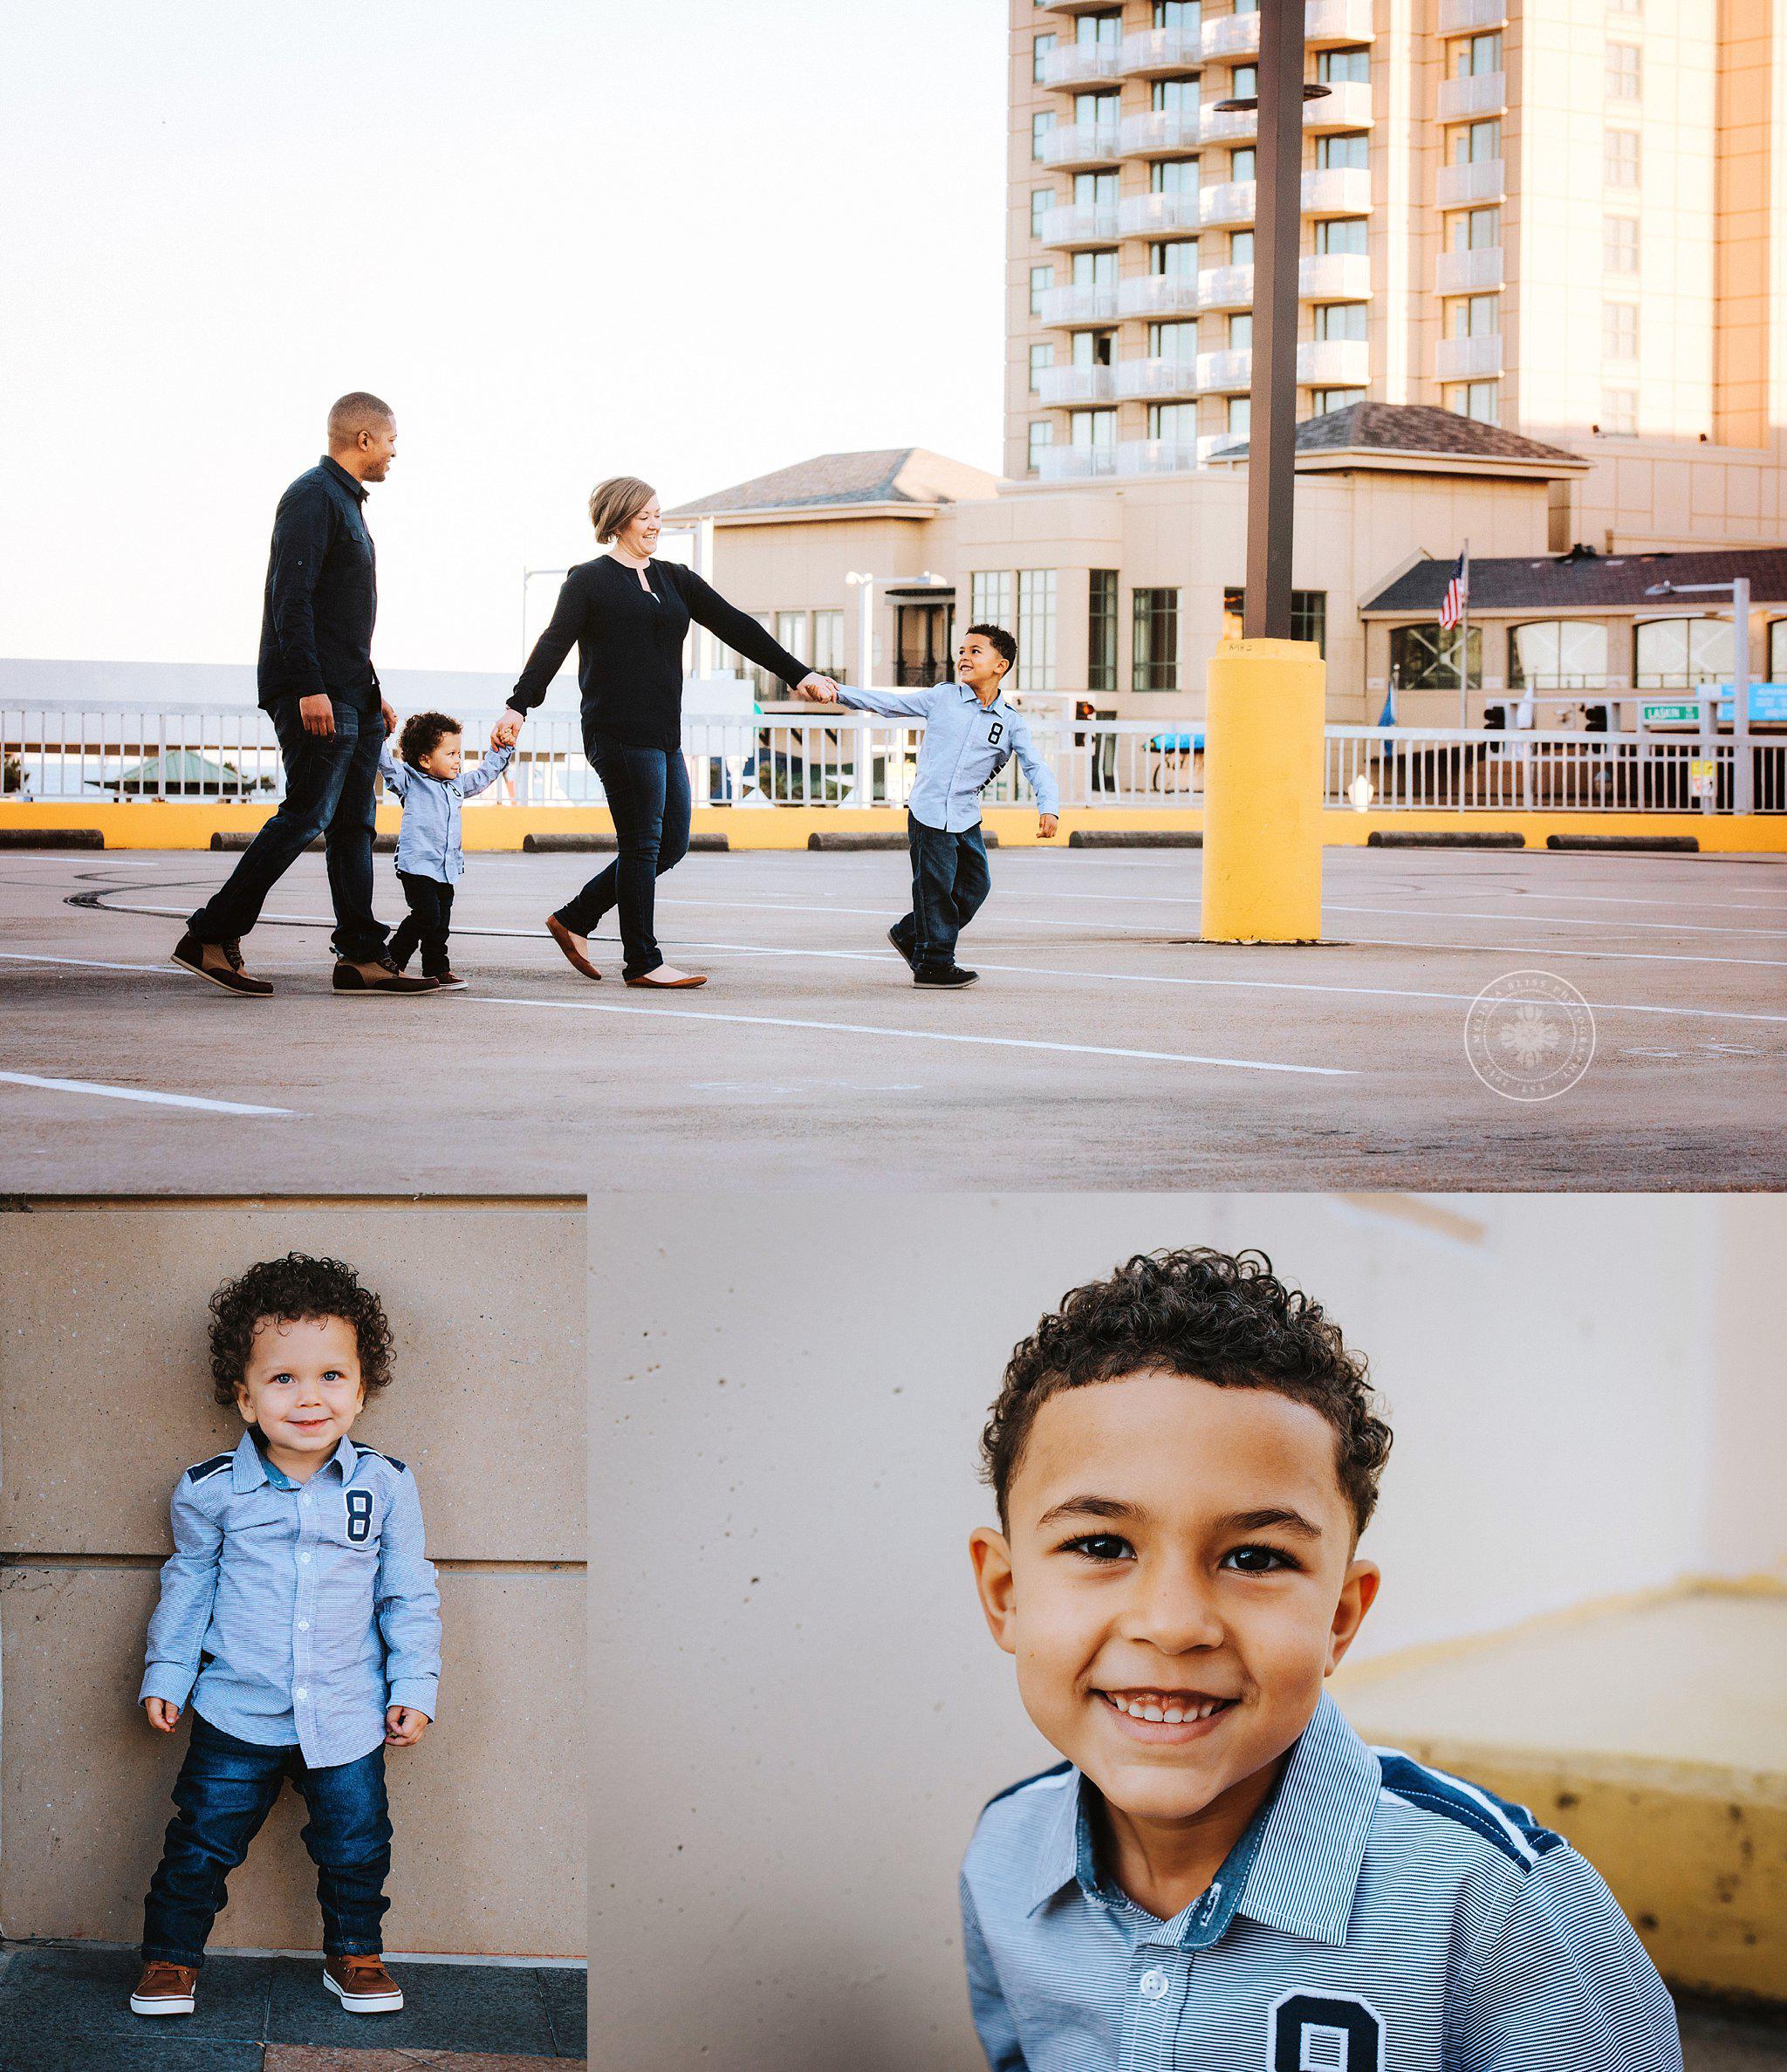 family-of-four-va-beach-boardwalk-photo-shoot-melissa-bliss-photography